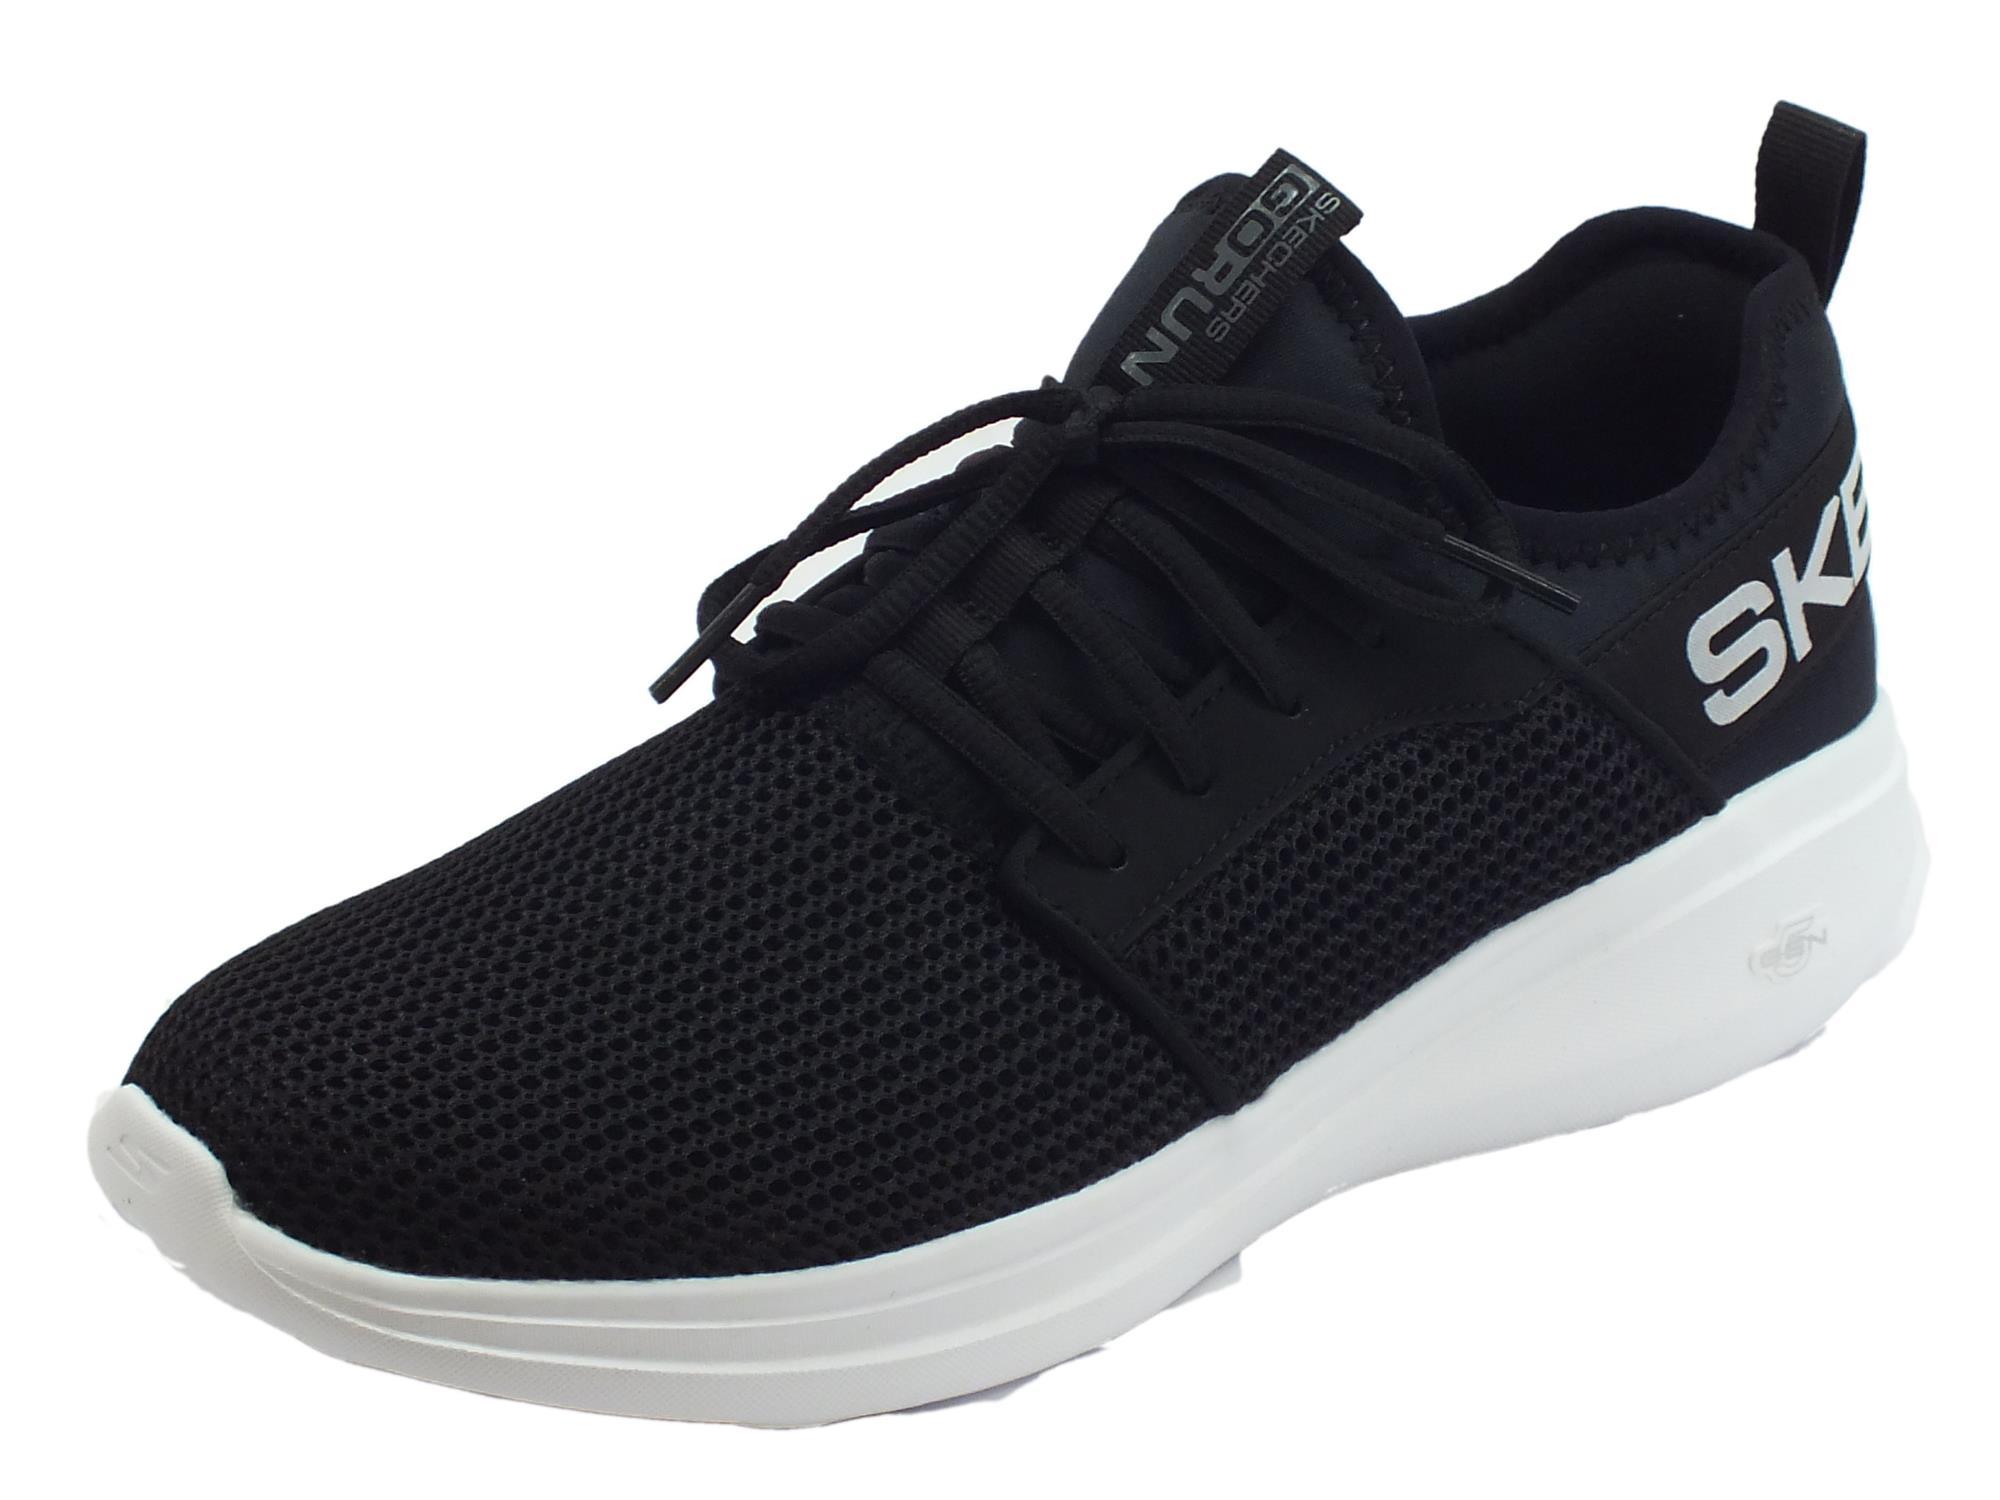 Skechers Go Run Fast Valor scarpe sportive uomo tessuto nero